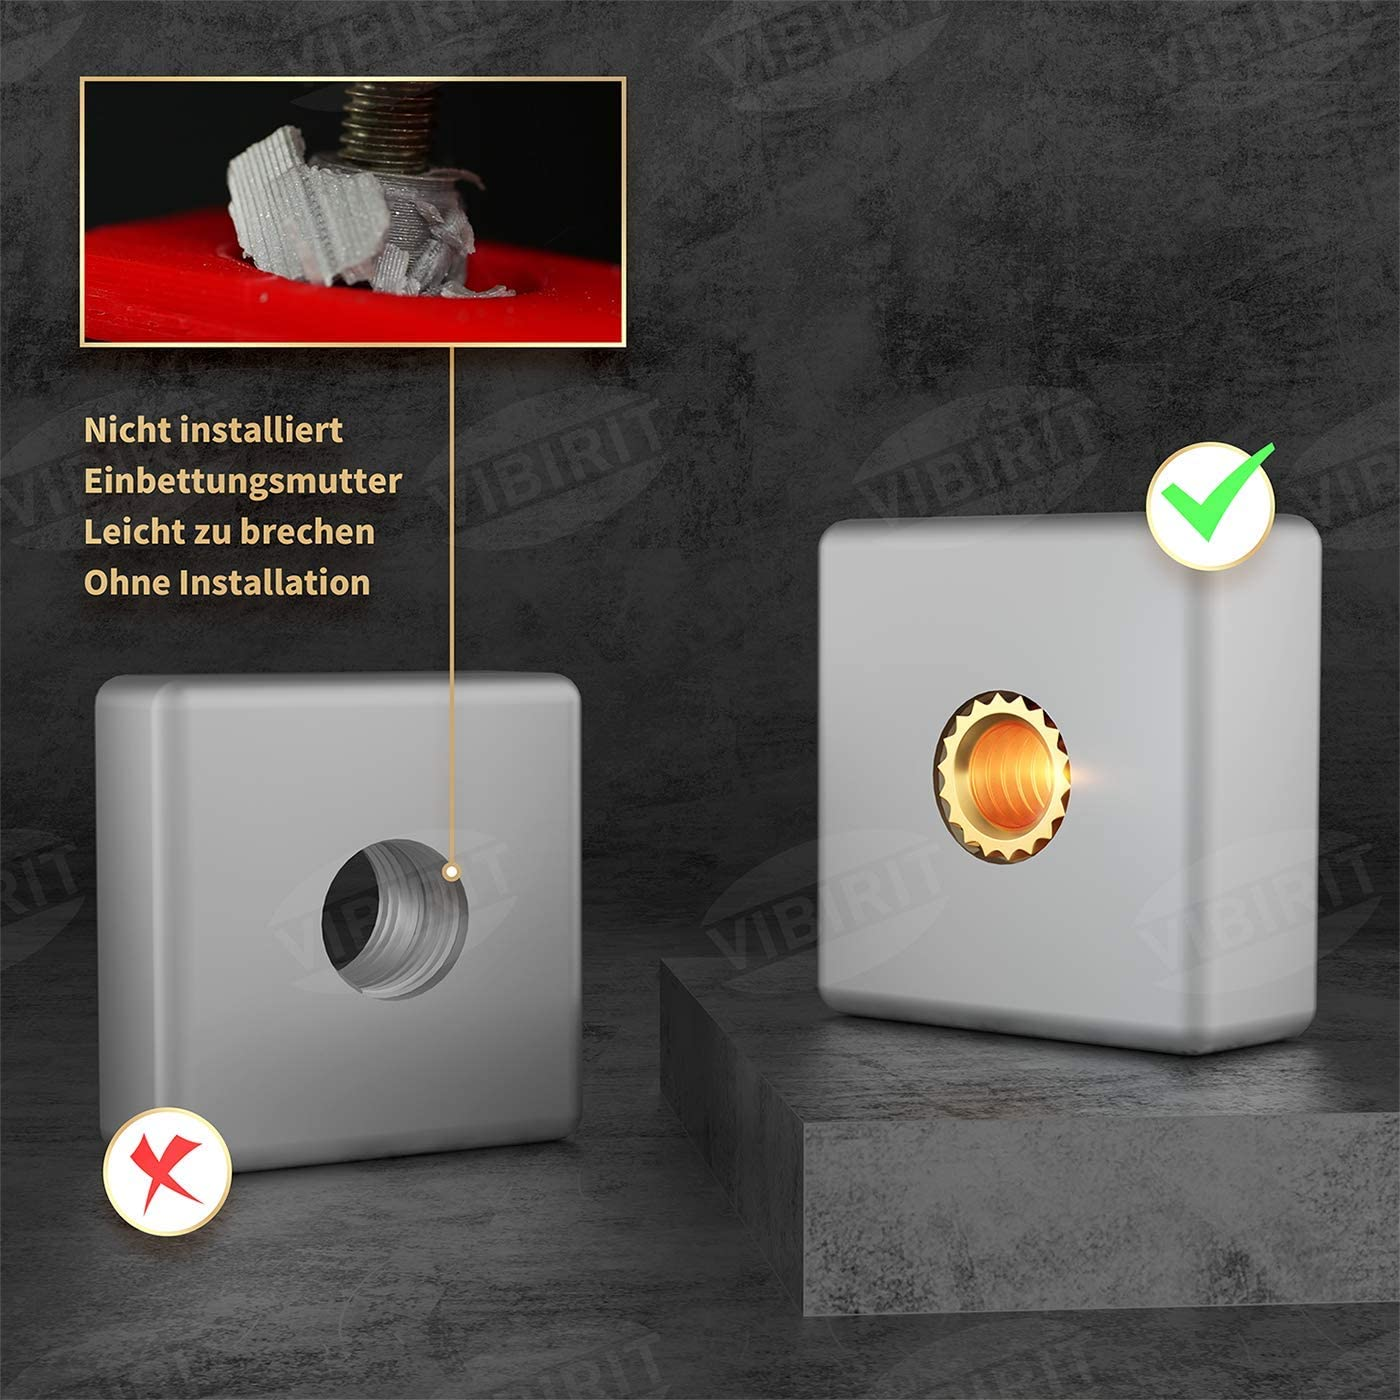 rosca interior VIBIRIT 100 piezas roscadas M3 rosca de rosca de lat/ón por calor o ultrasonidos en piezas de impresora 3D M3